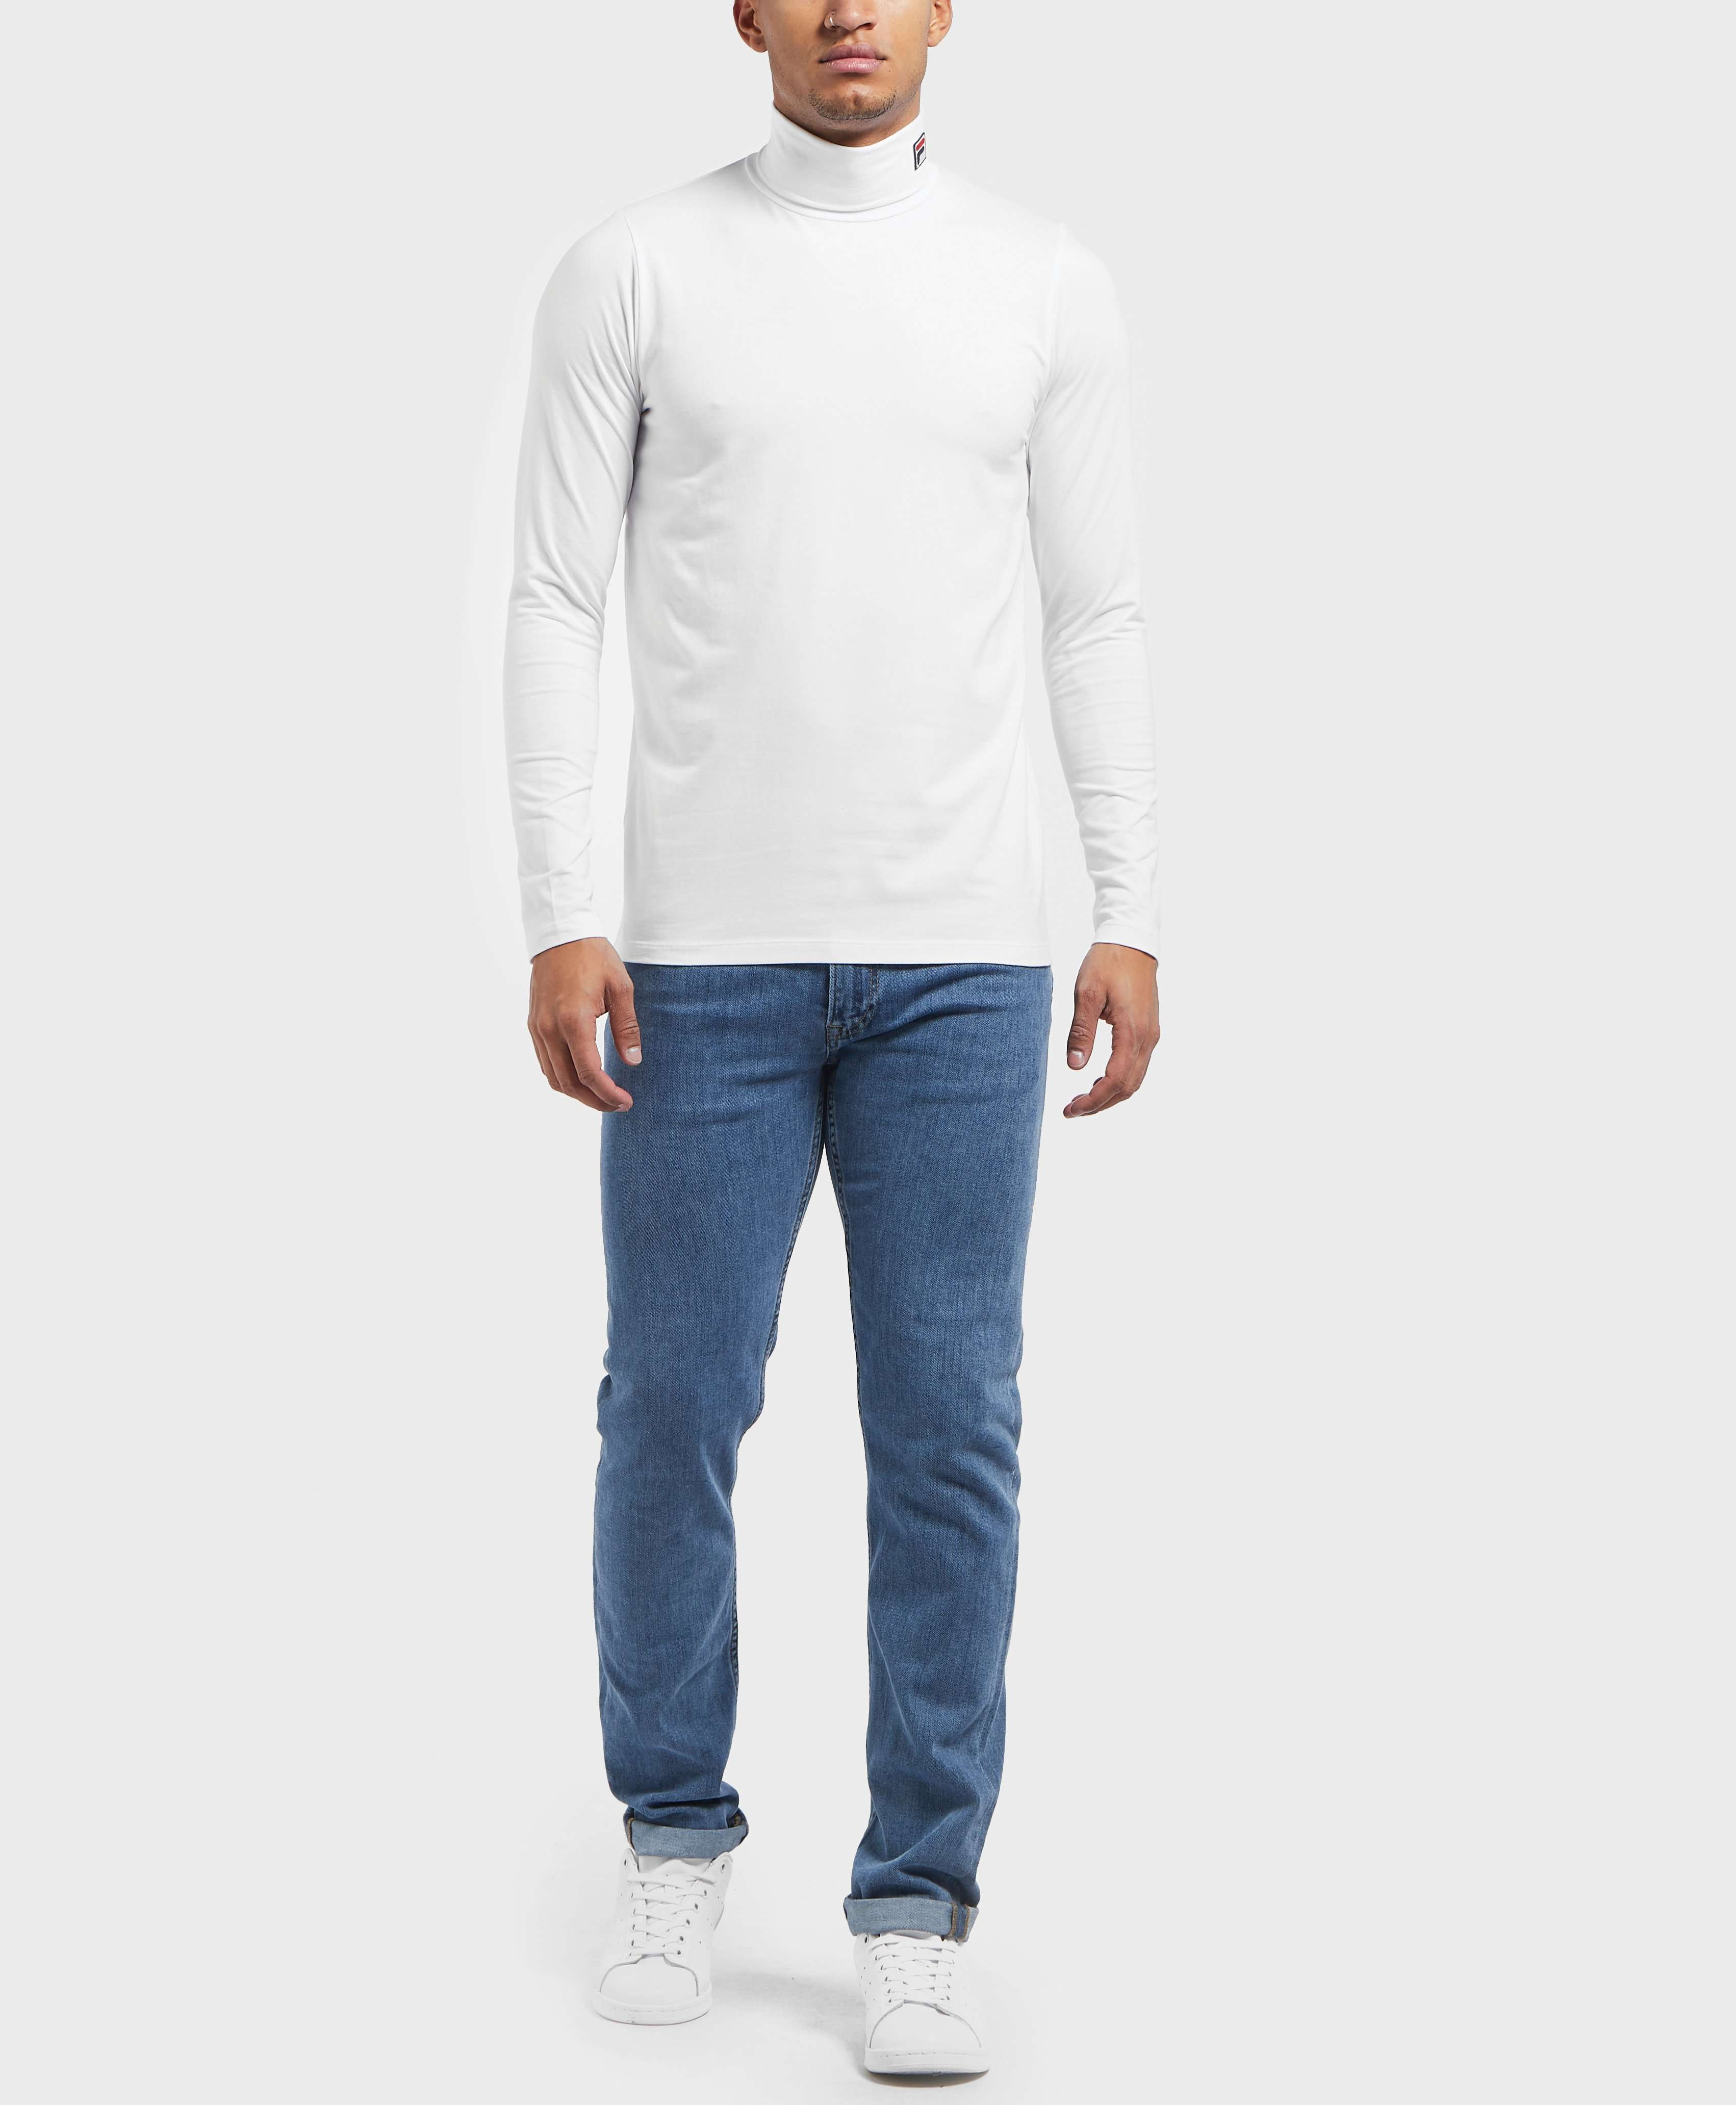 Fila 19th Roll Neck Long Sleeve T-Shirt